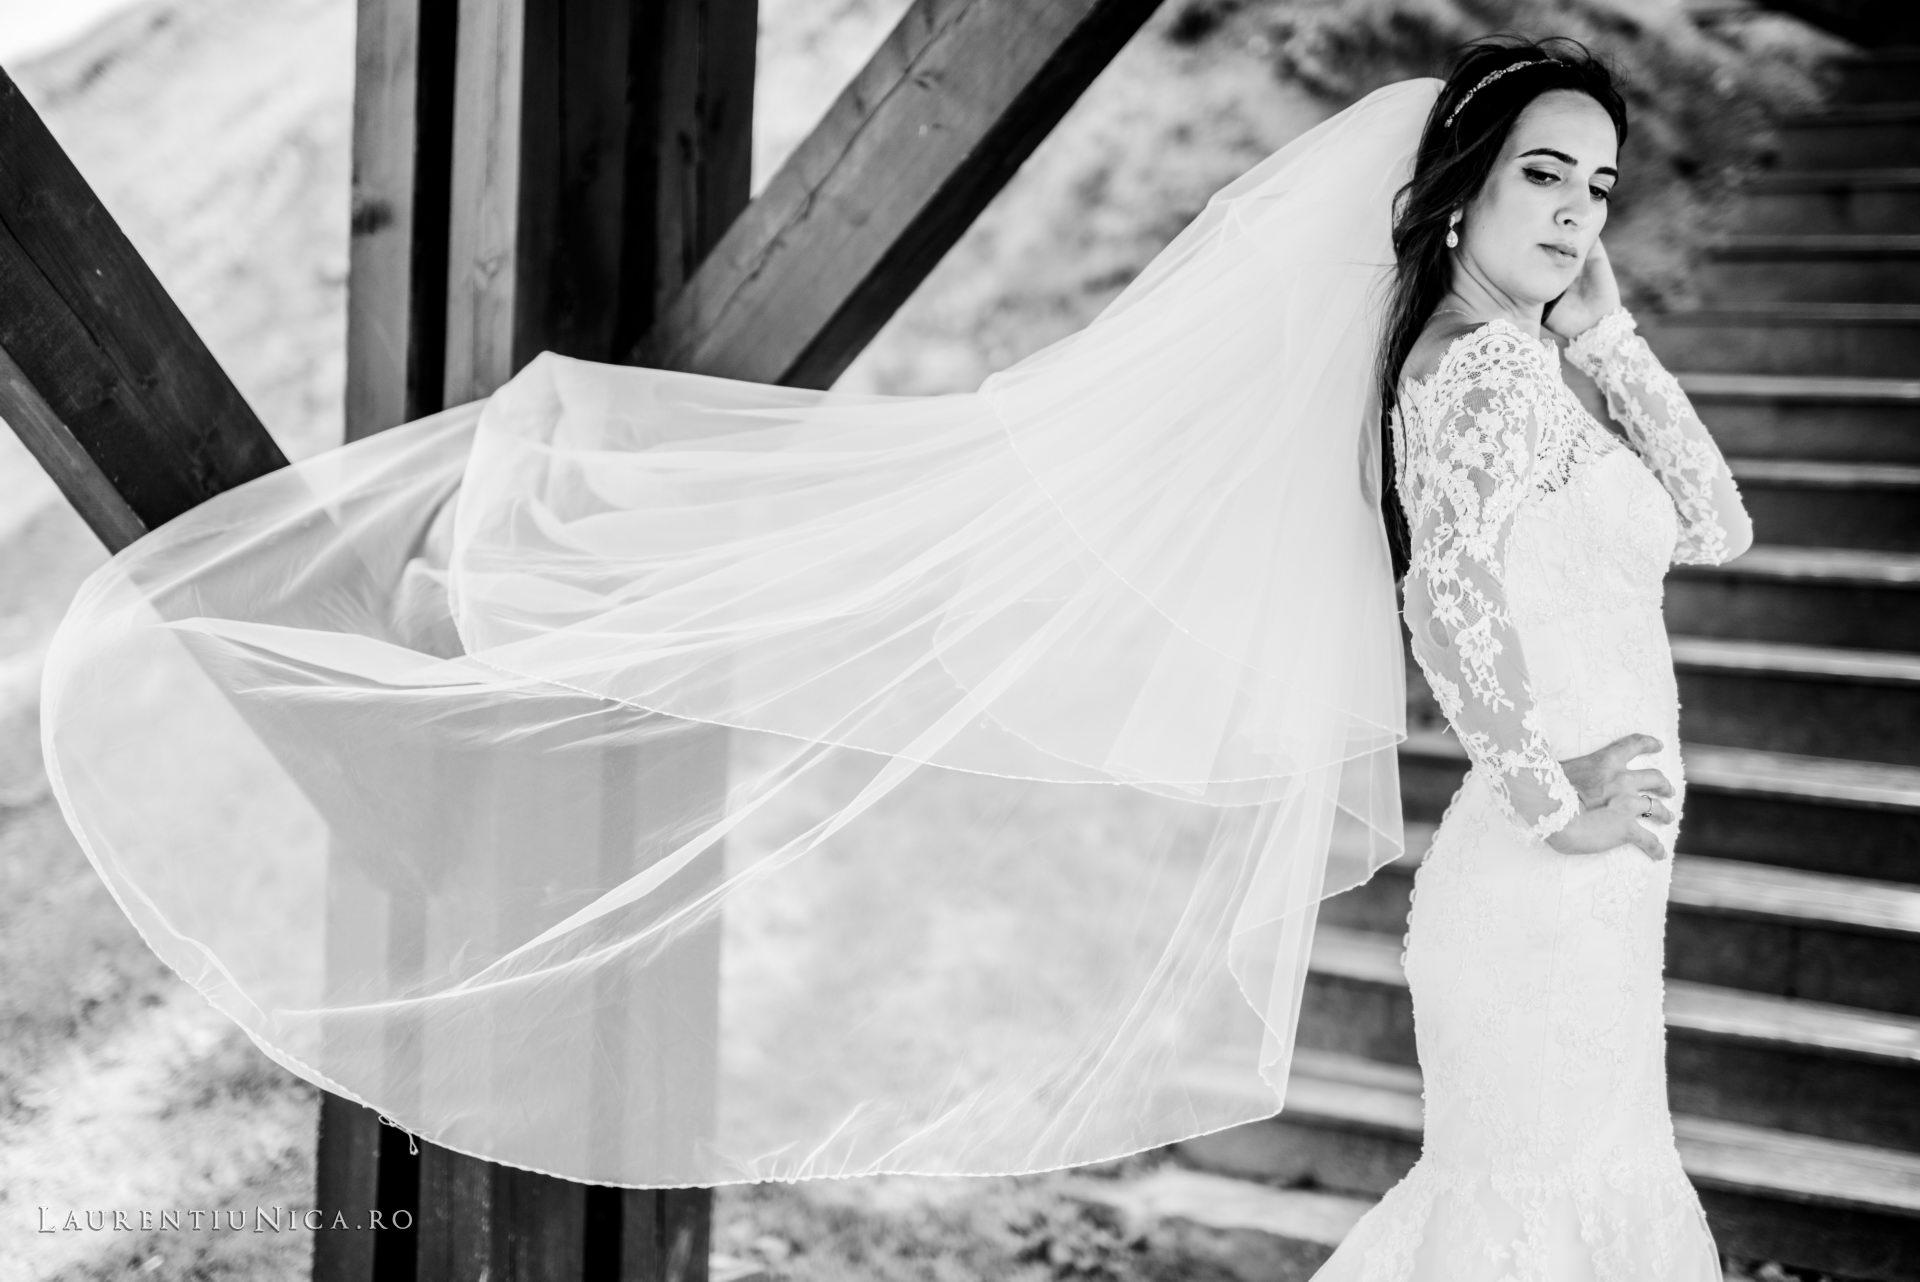 cristina_si_ovidiu-after-wedding-alba-iulia_fotograf_laurentiu_nica_23